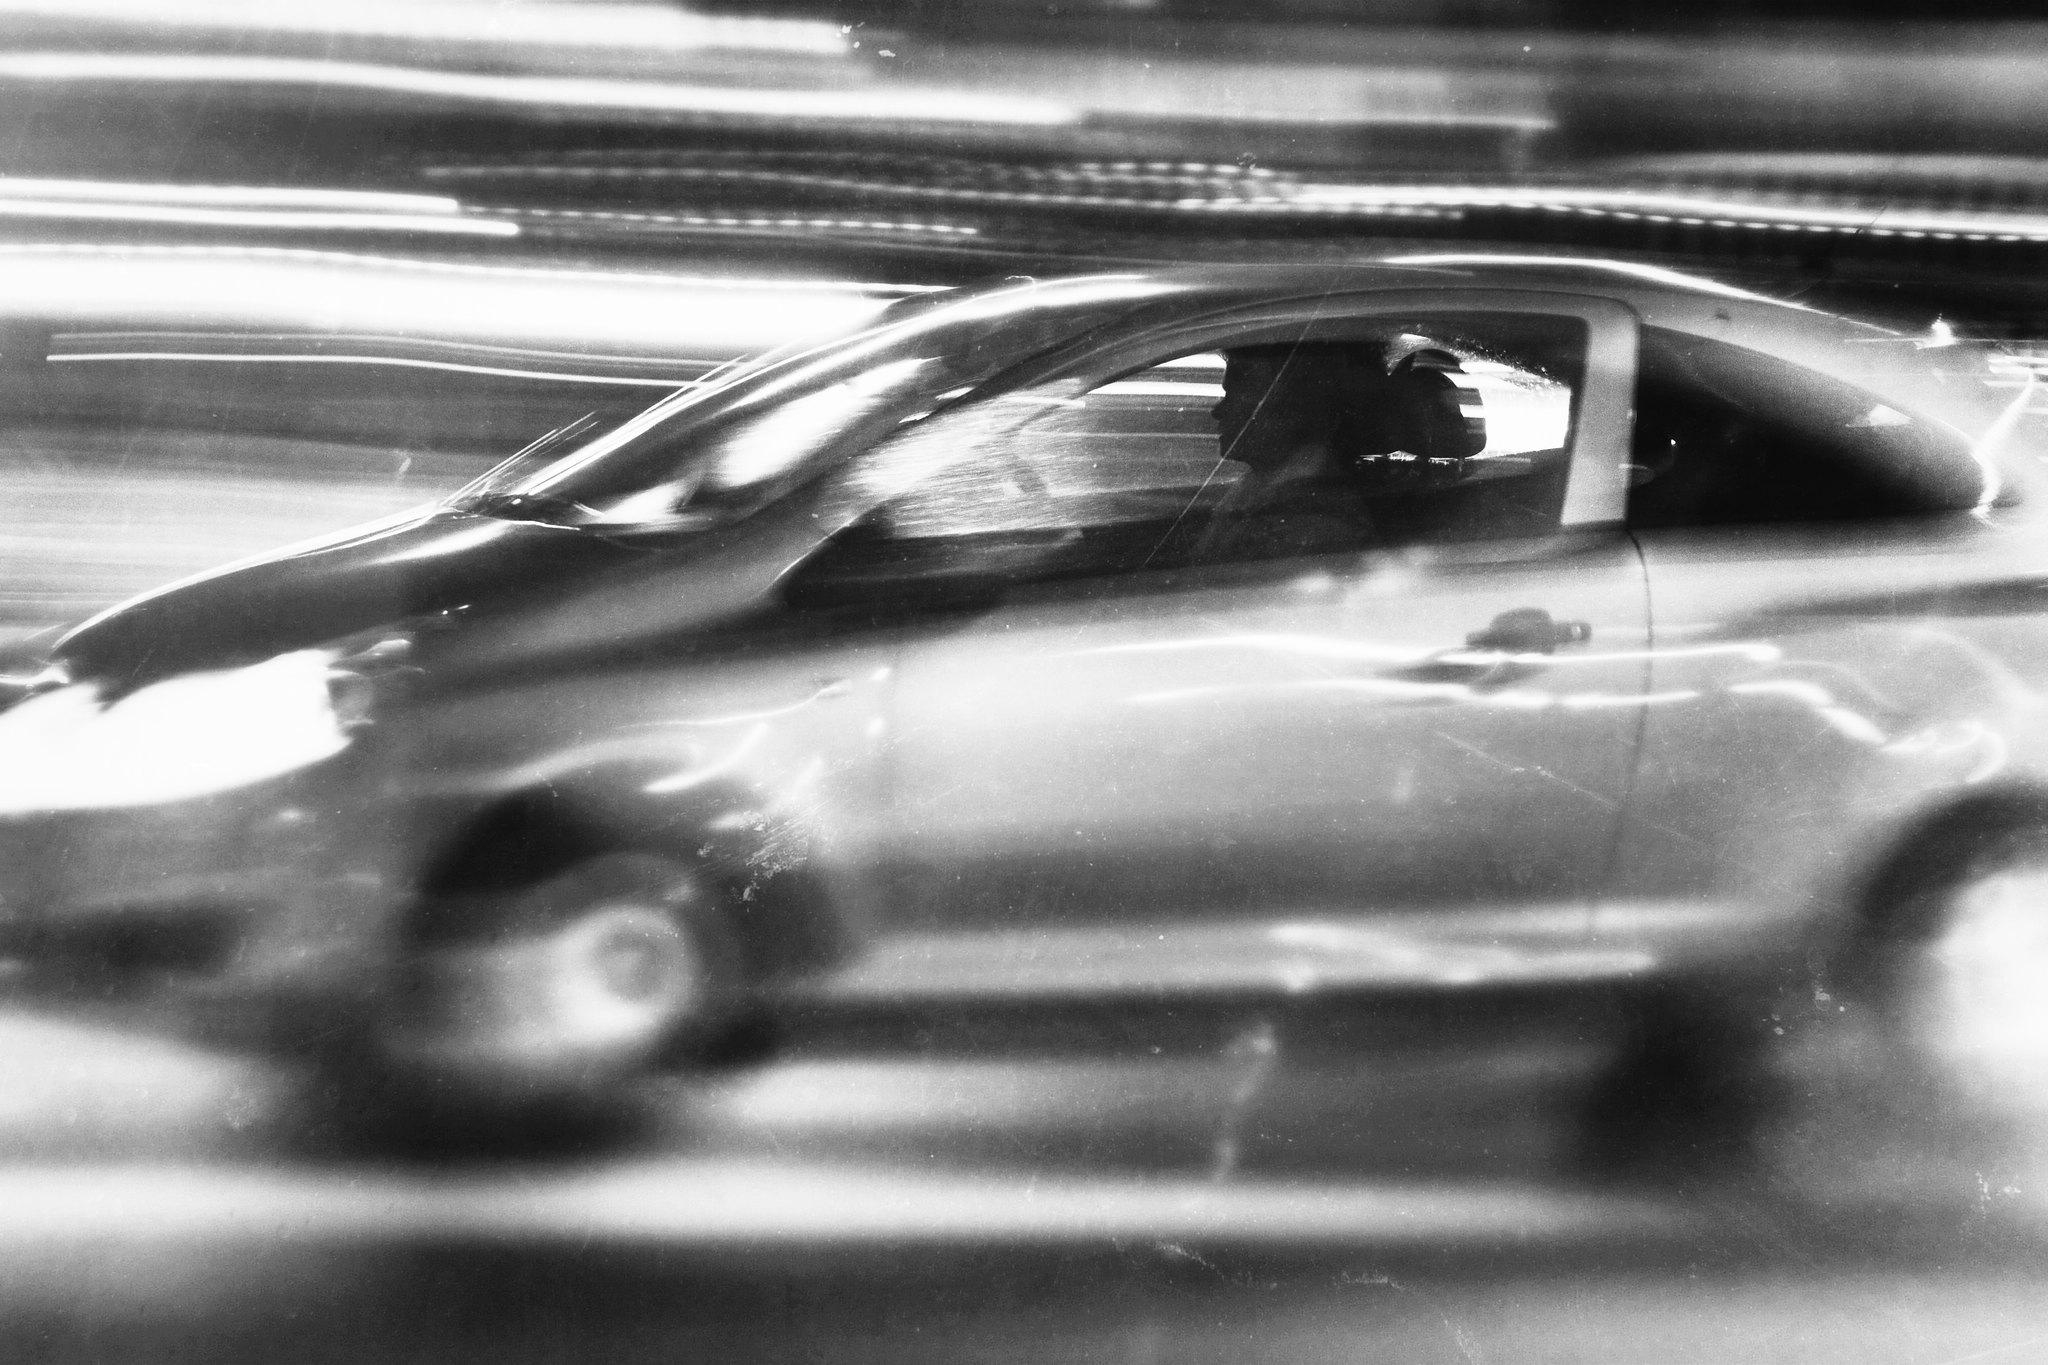 5 ways to soothe road rage